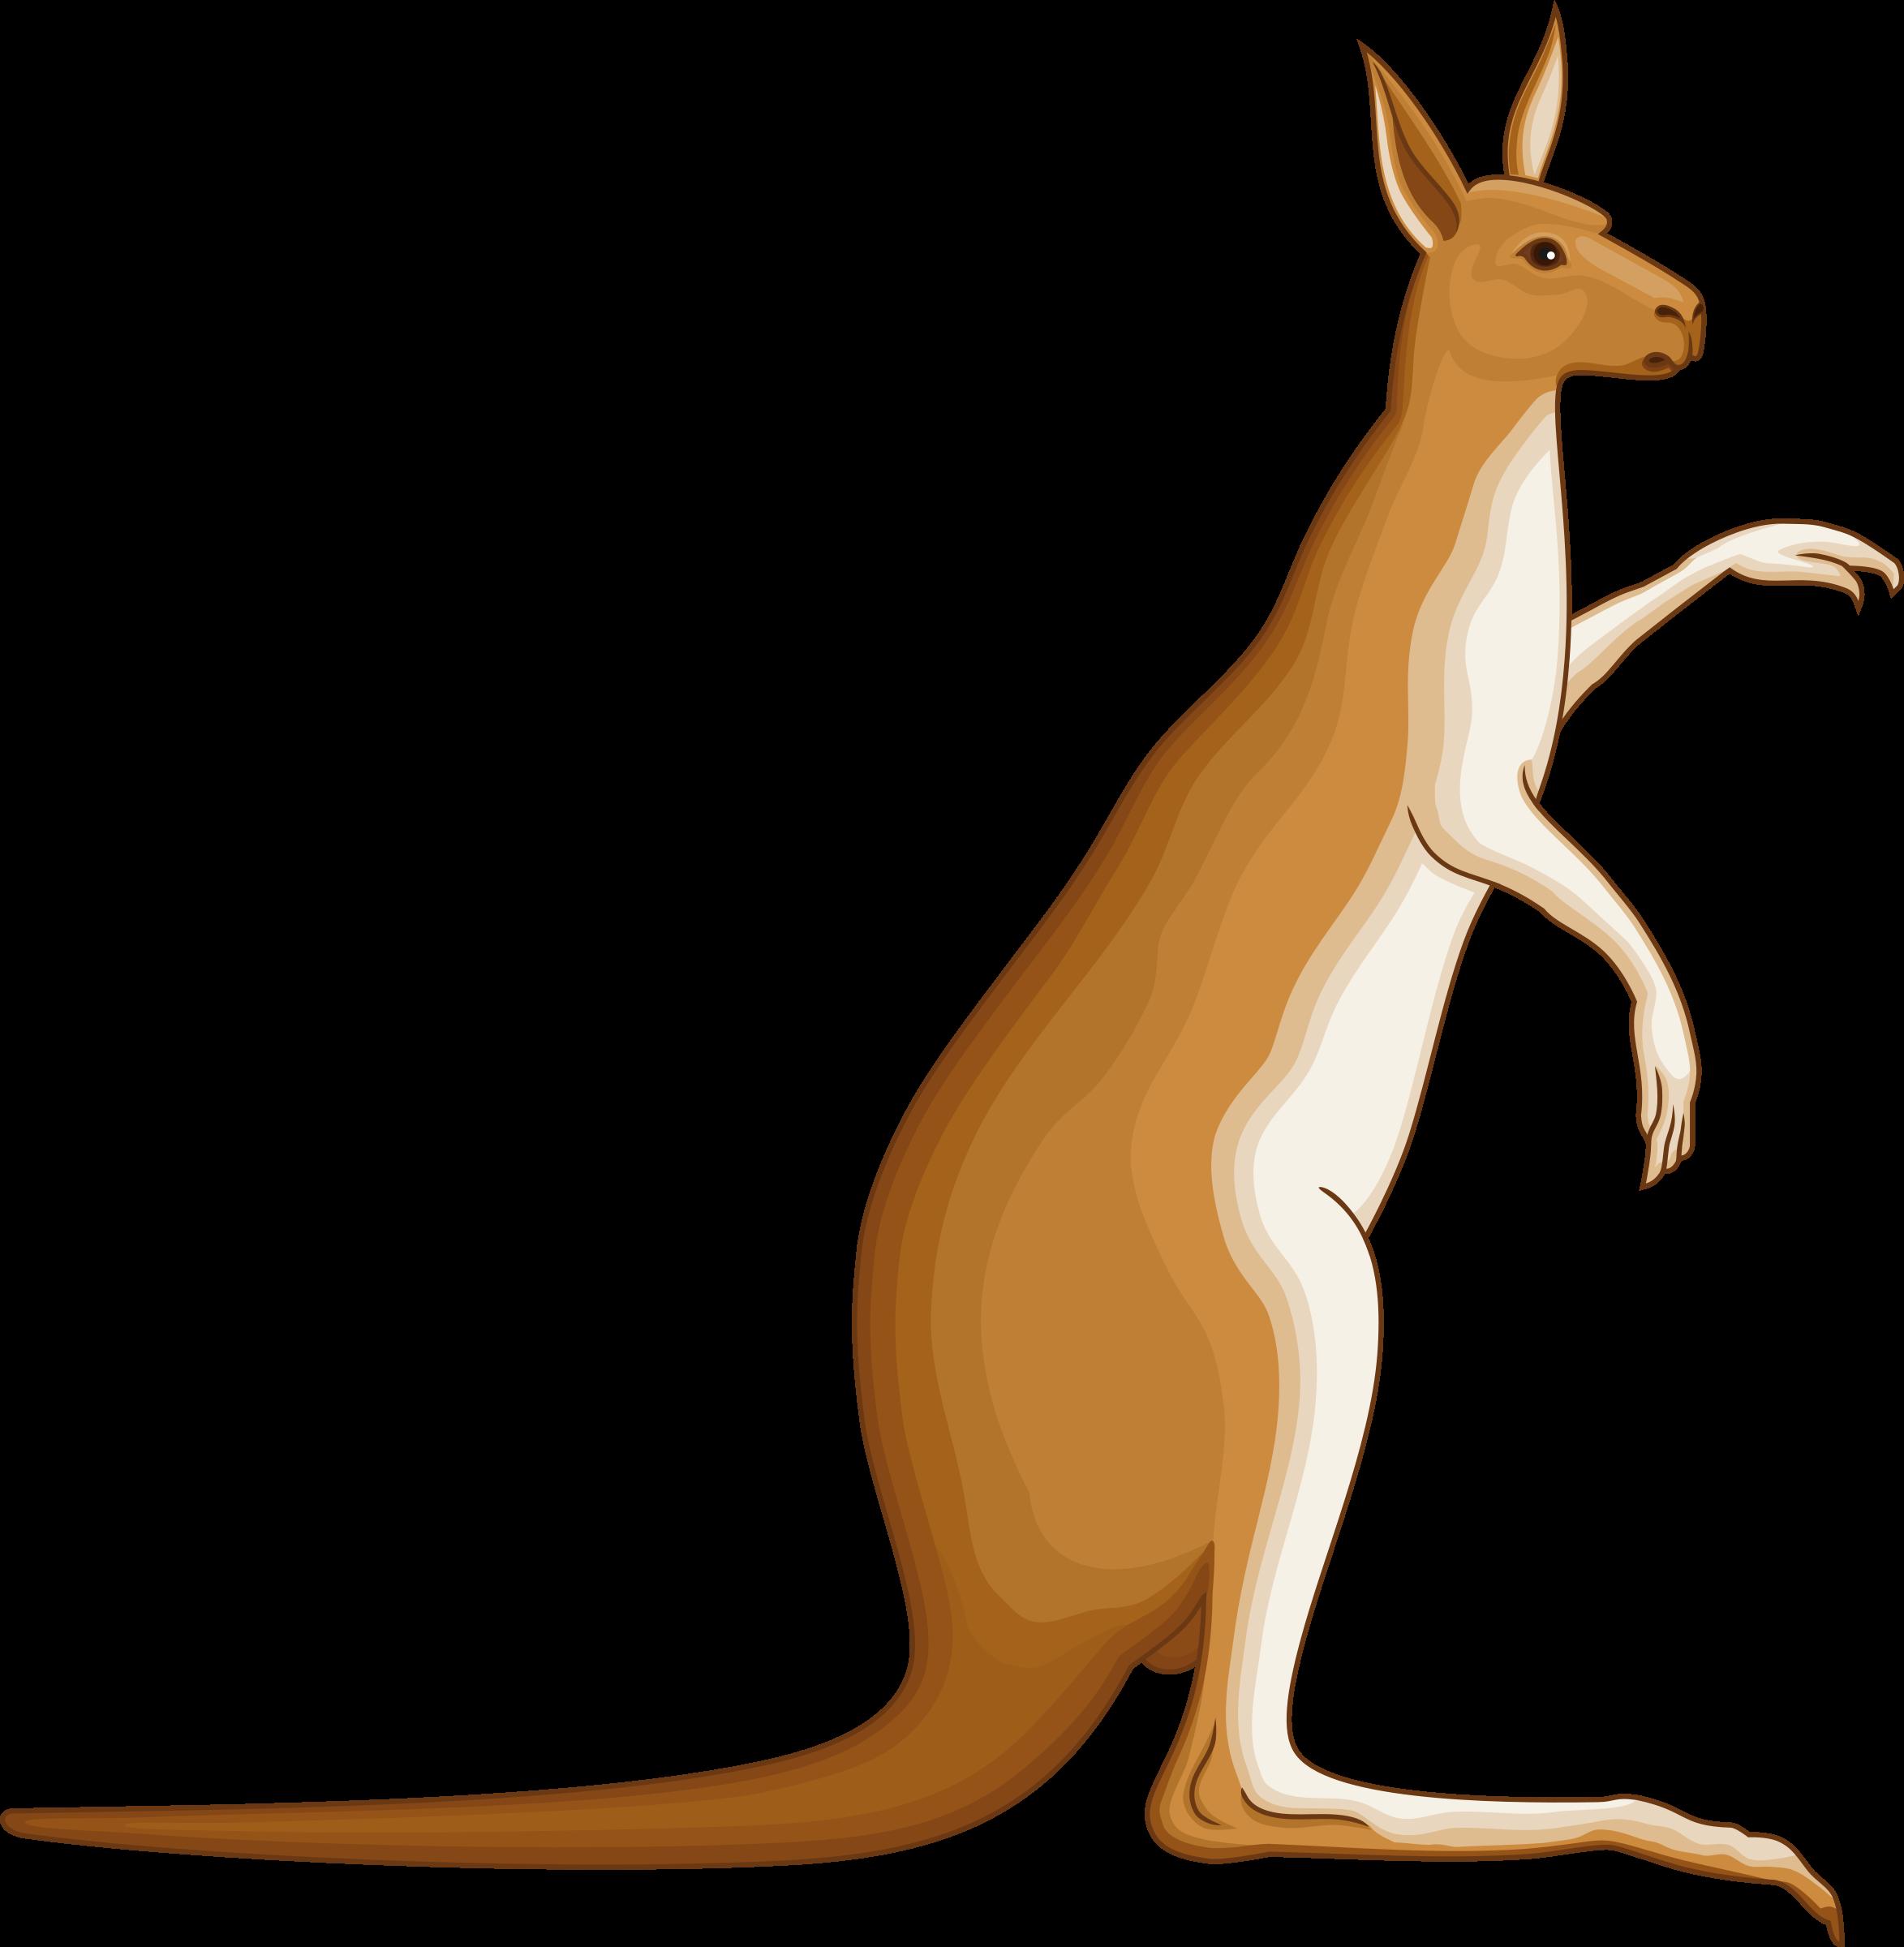 clip transparent library Clipart kangaroo. Big image png